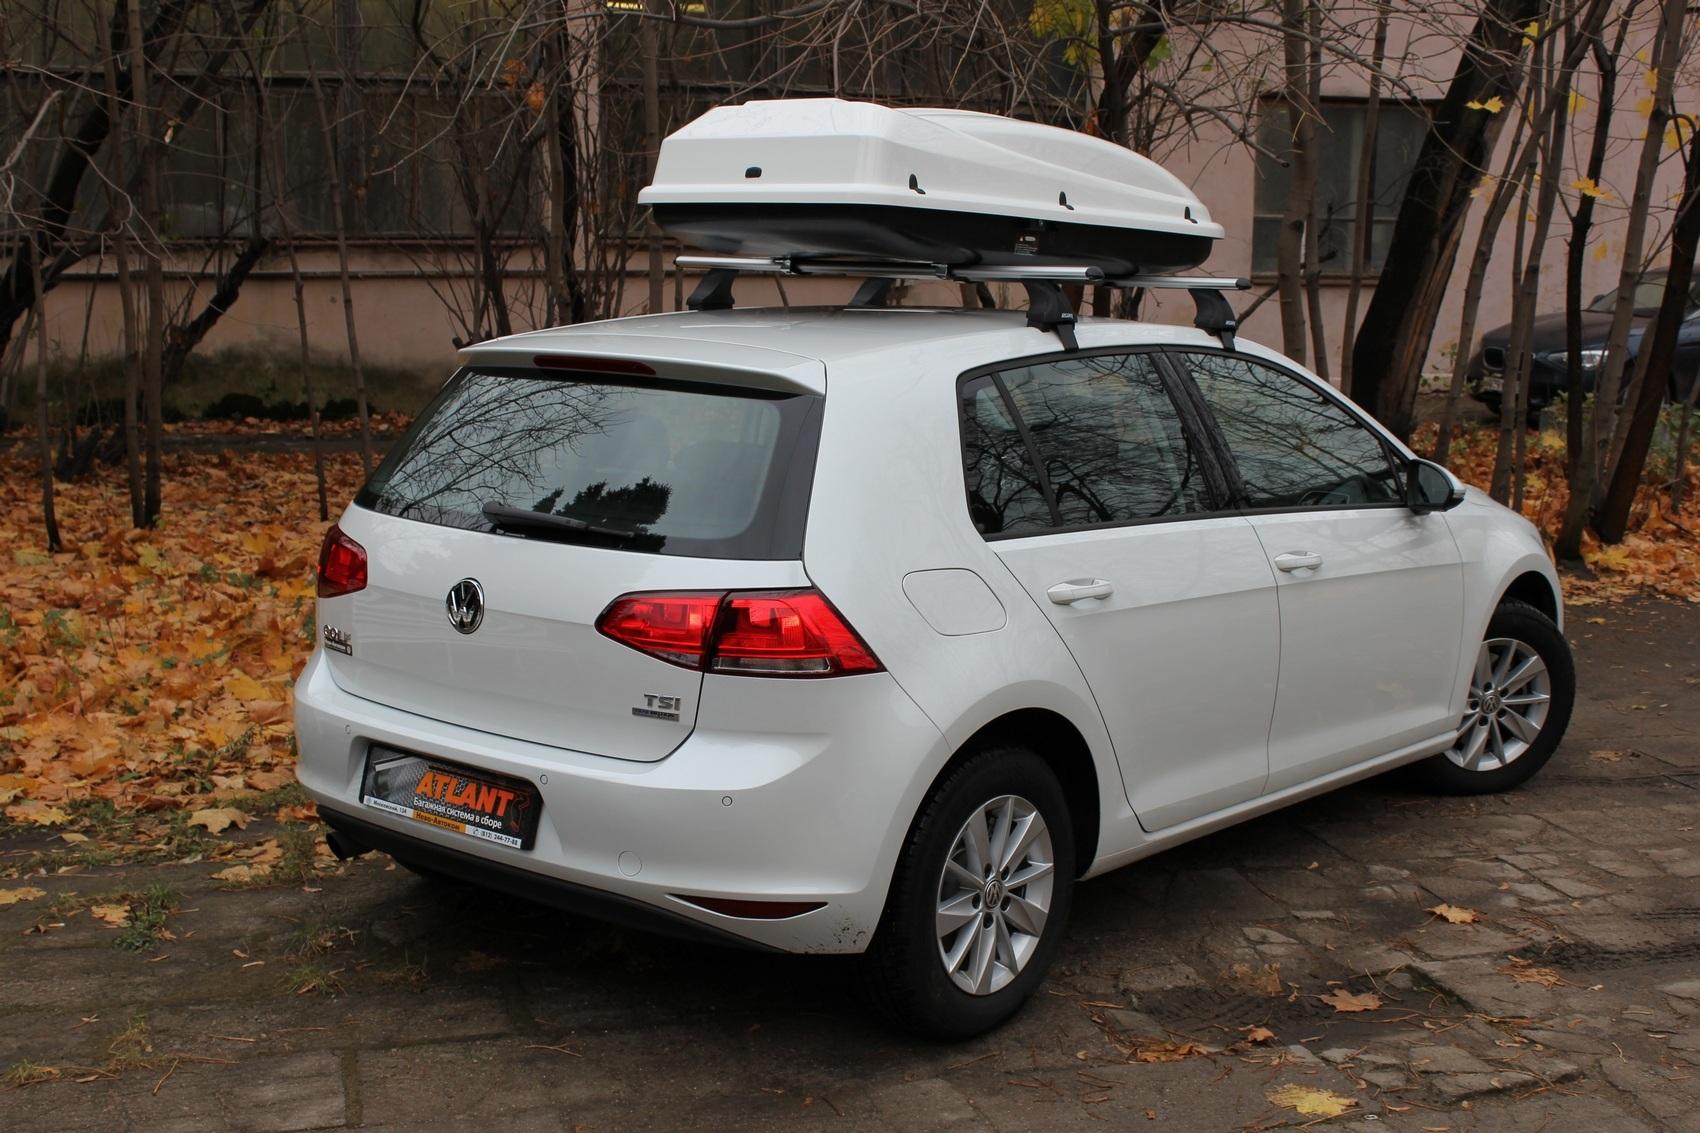 Багажник на крышу автомобиля Атлант